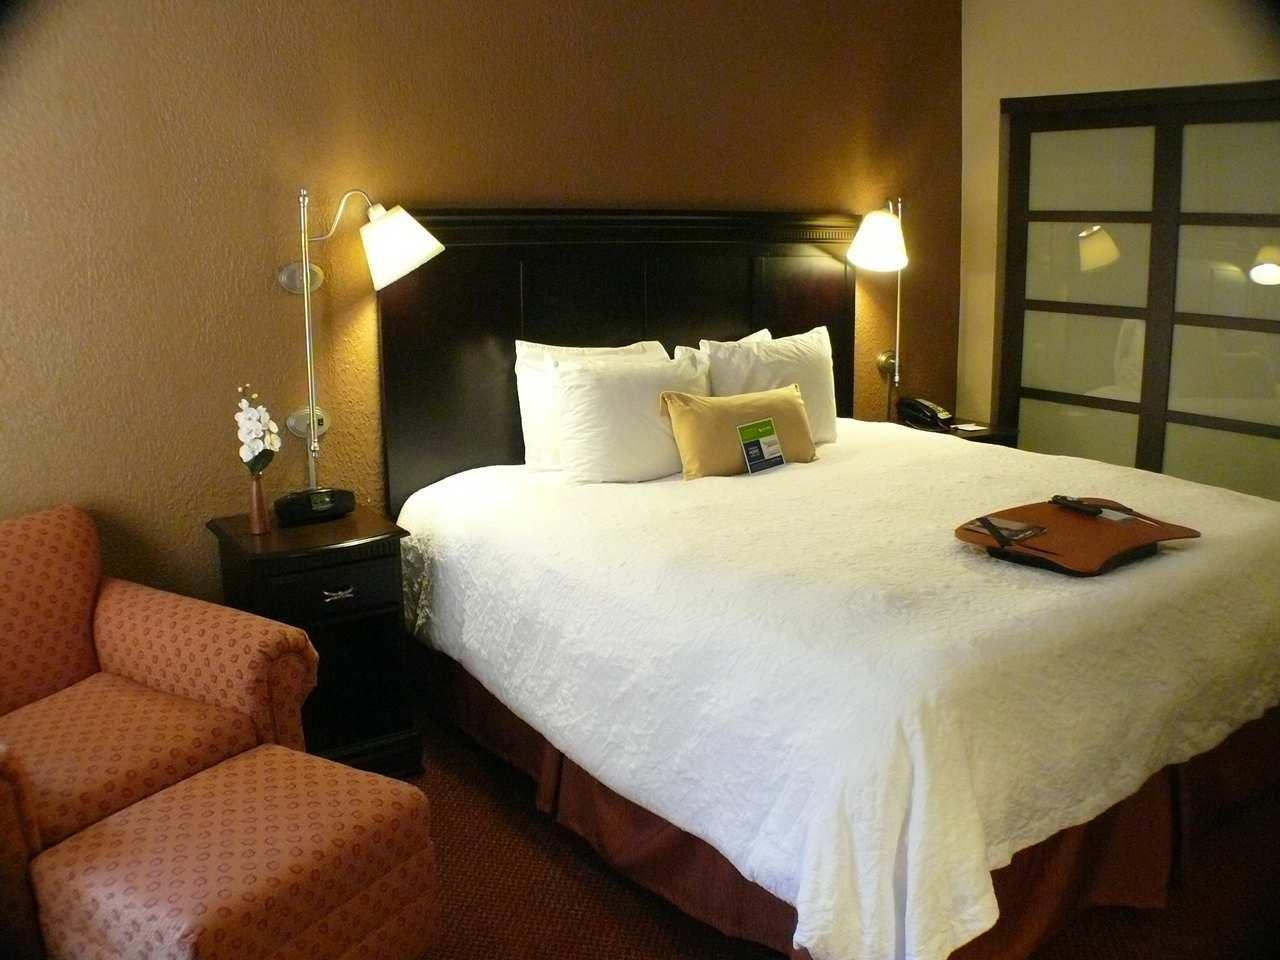 Hampton Inn & Suites Chicago/Hoffman Estates image 10